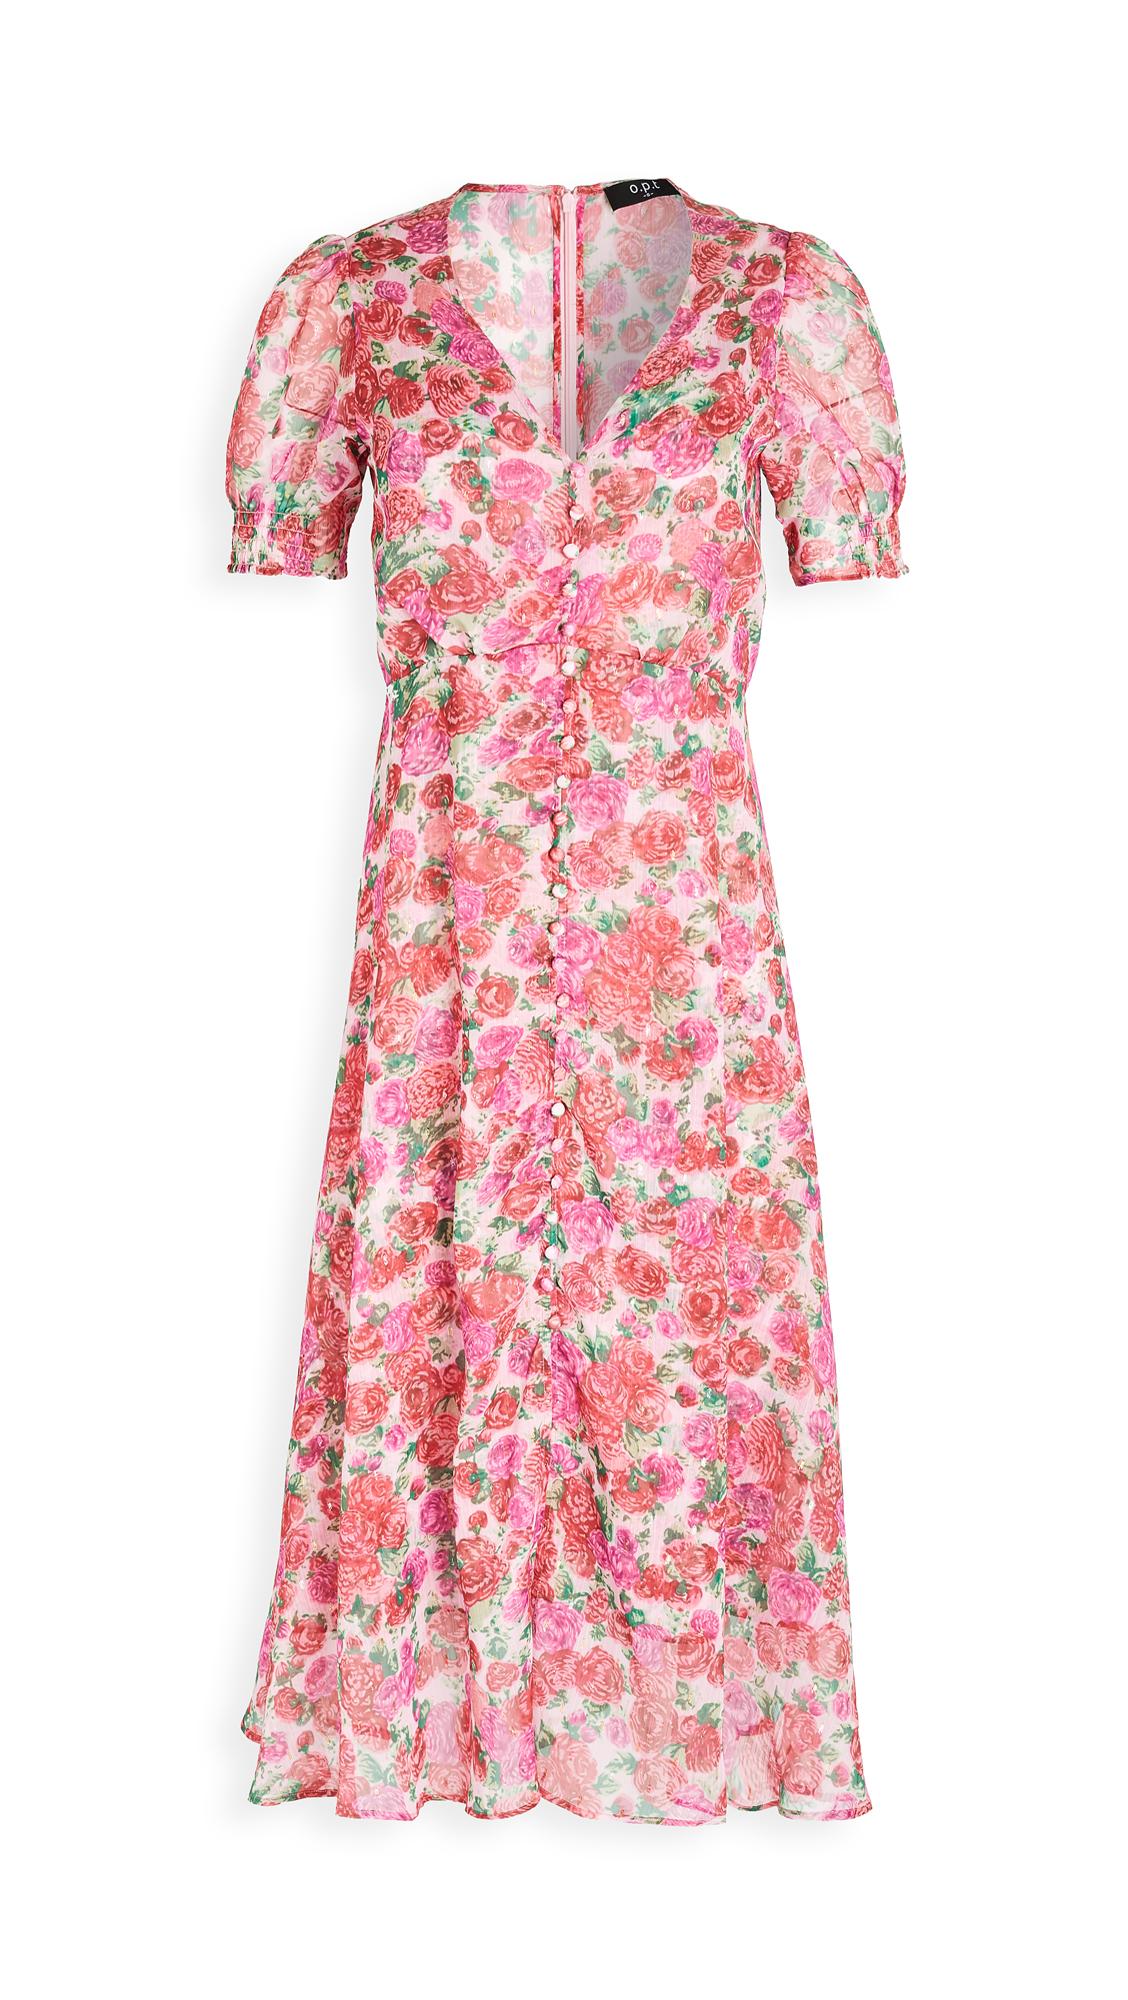 OPT Lorena Dress